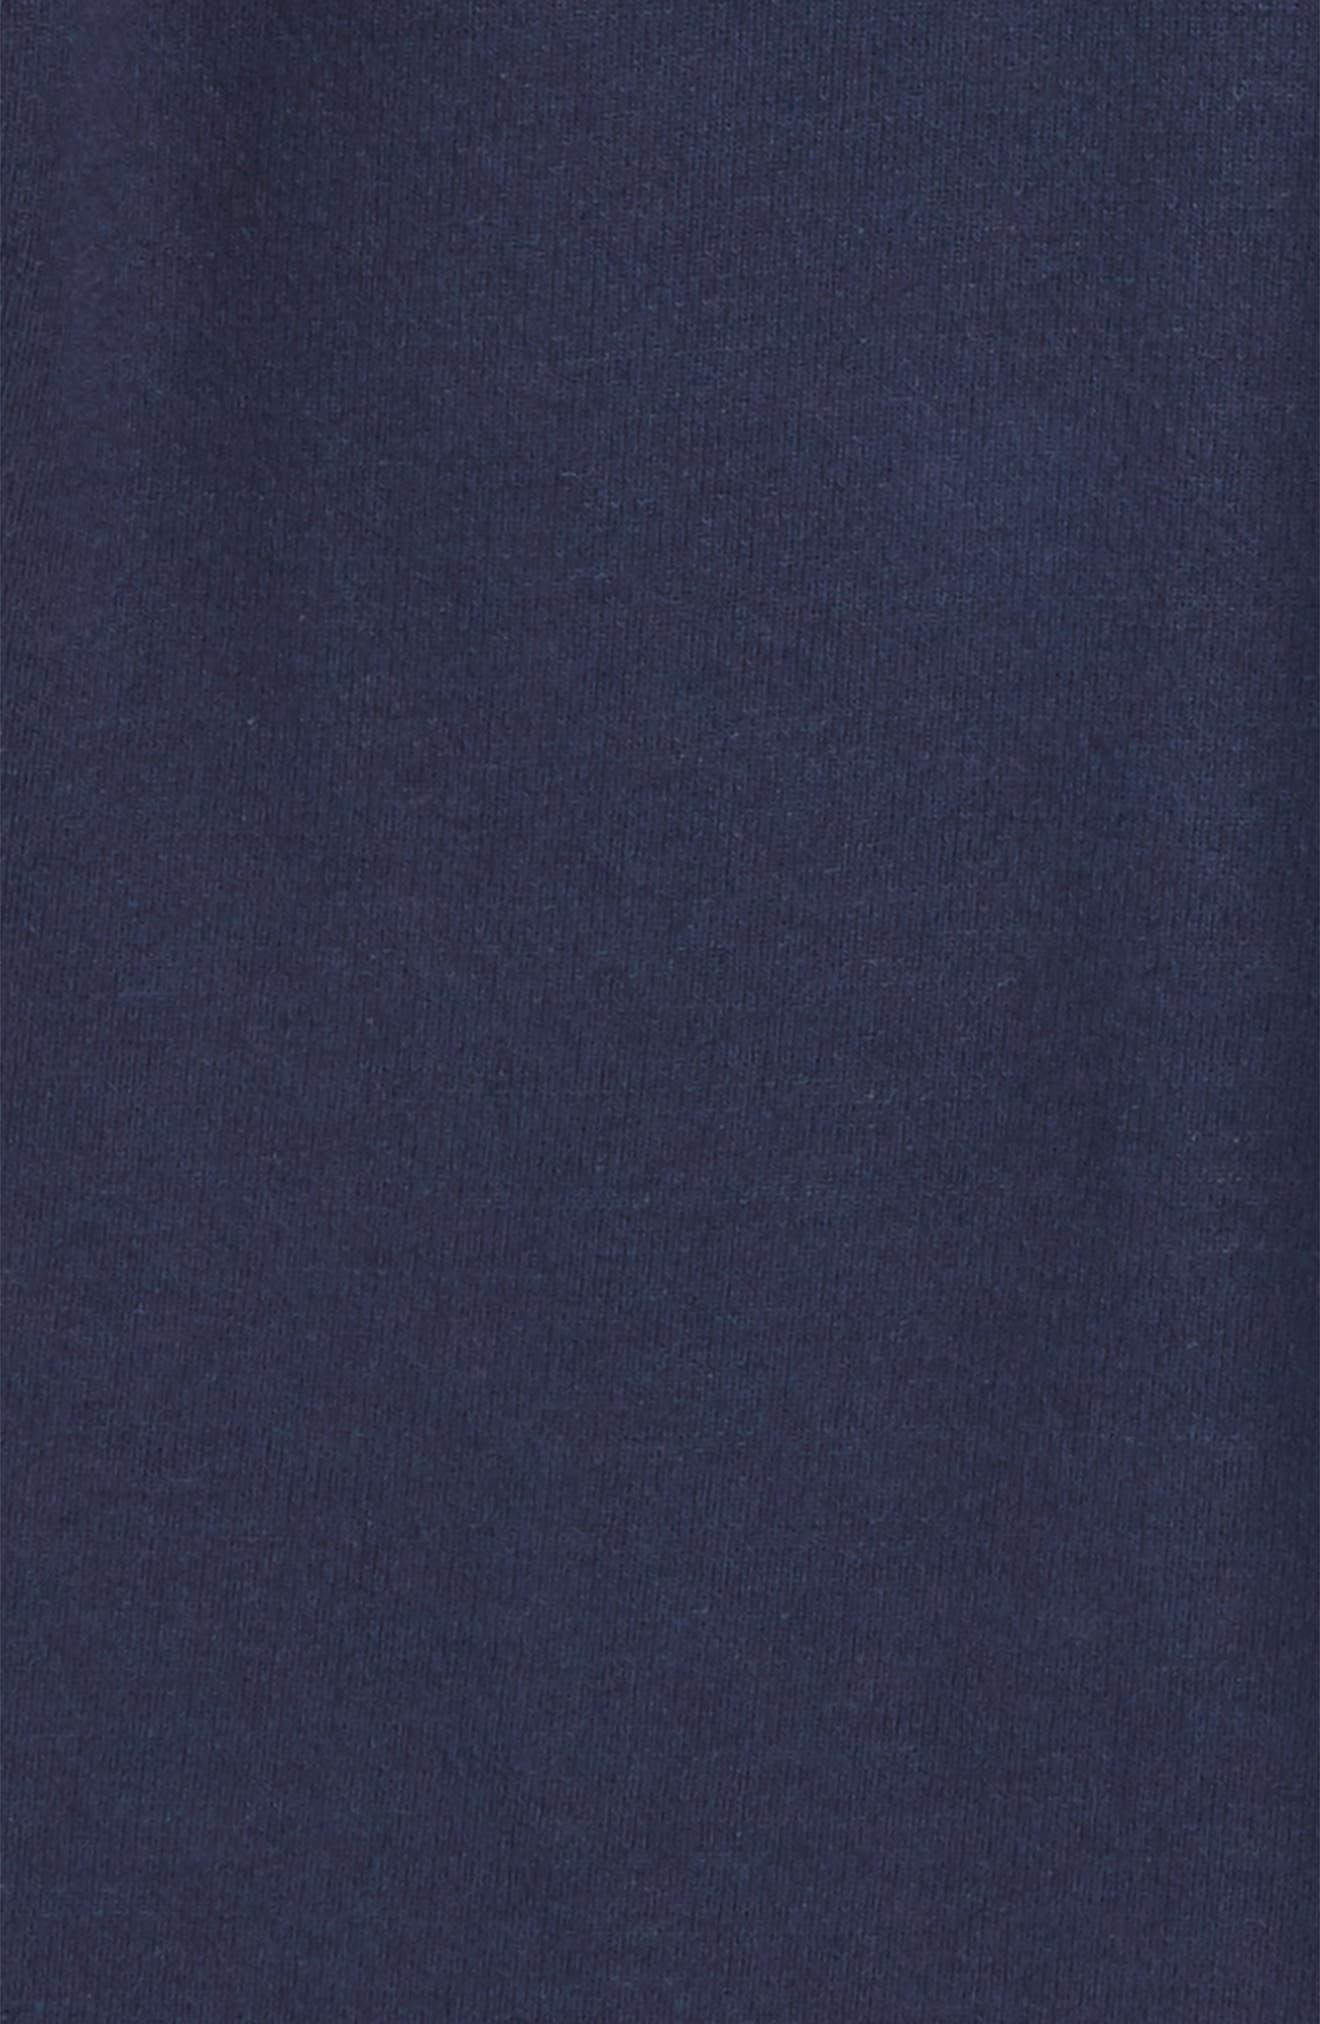 Paneled Shorts,                             Alternate thumbnail 2, color,                             Academy Blue